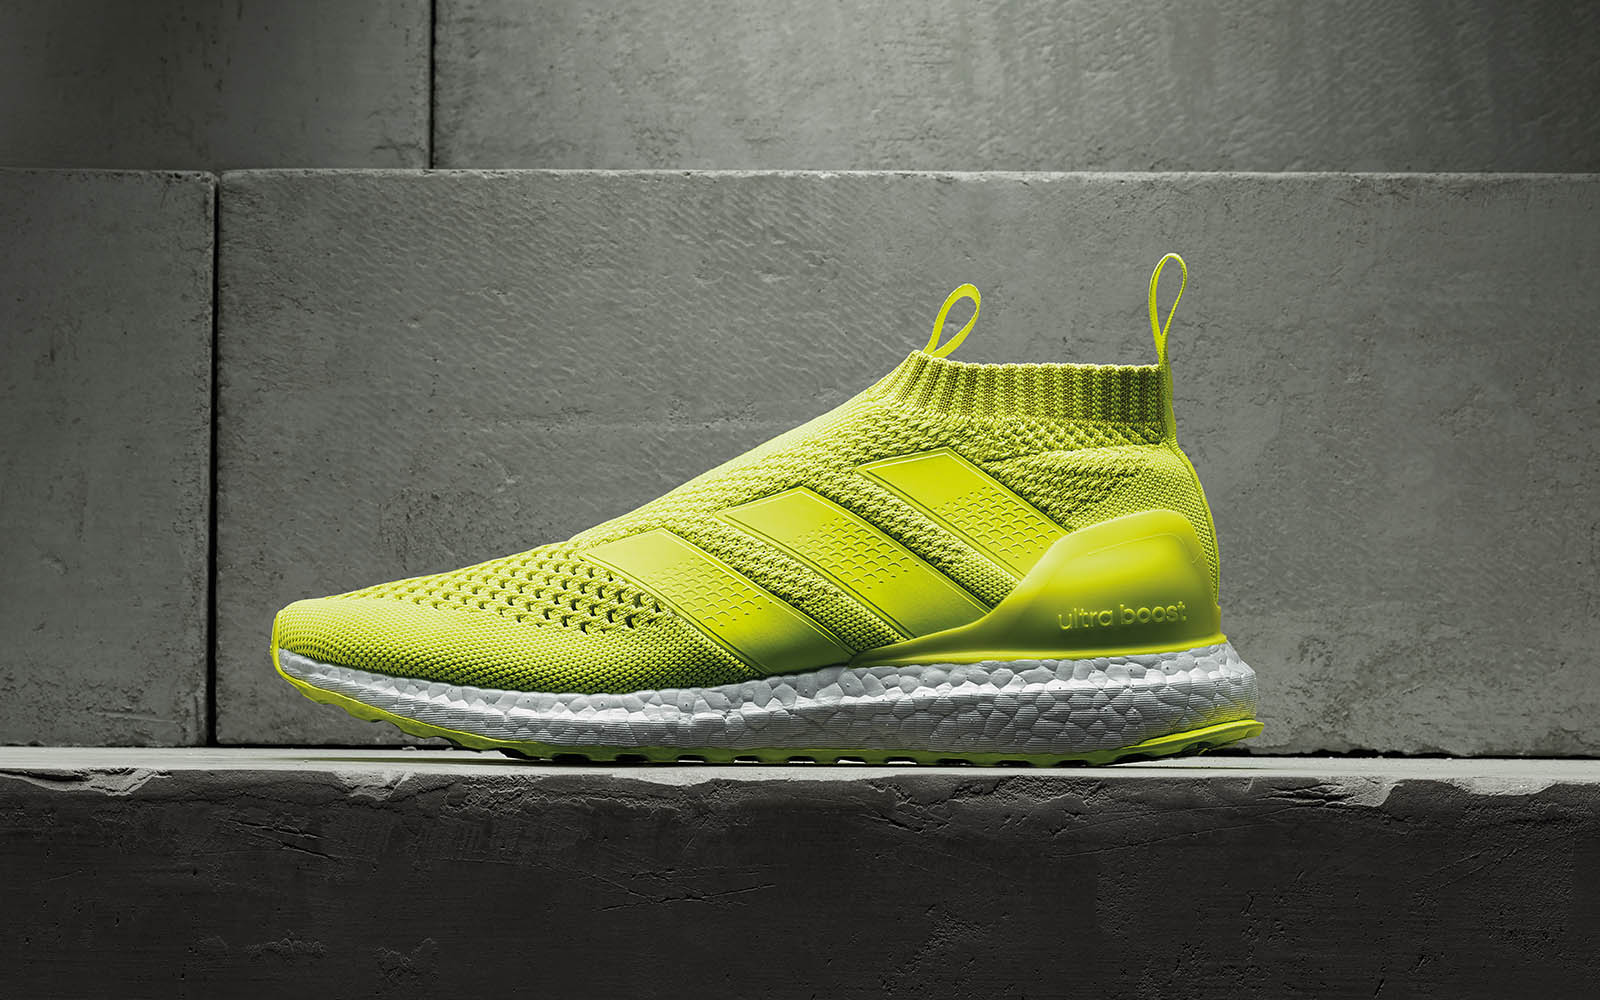 76bdfff9de83 ... discount code for adidas ace 16 purecontrol ultra boost vapor green blue  547b2 1f5d9